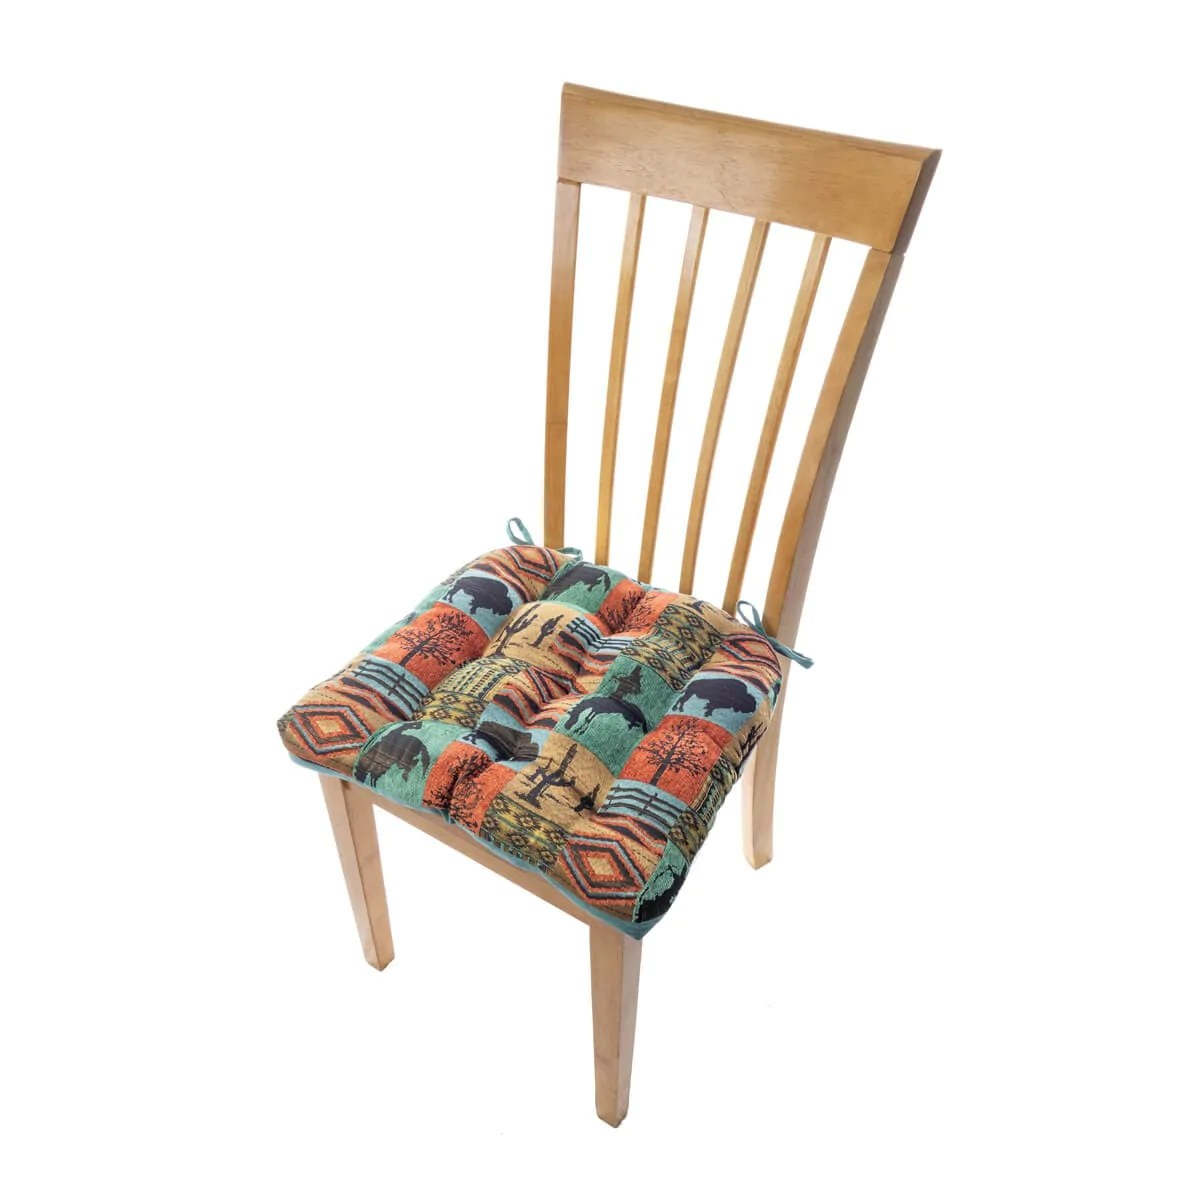 southwest dining chairs hanging chair gumtree sydney laramie pad latex foam fill